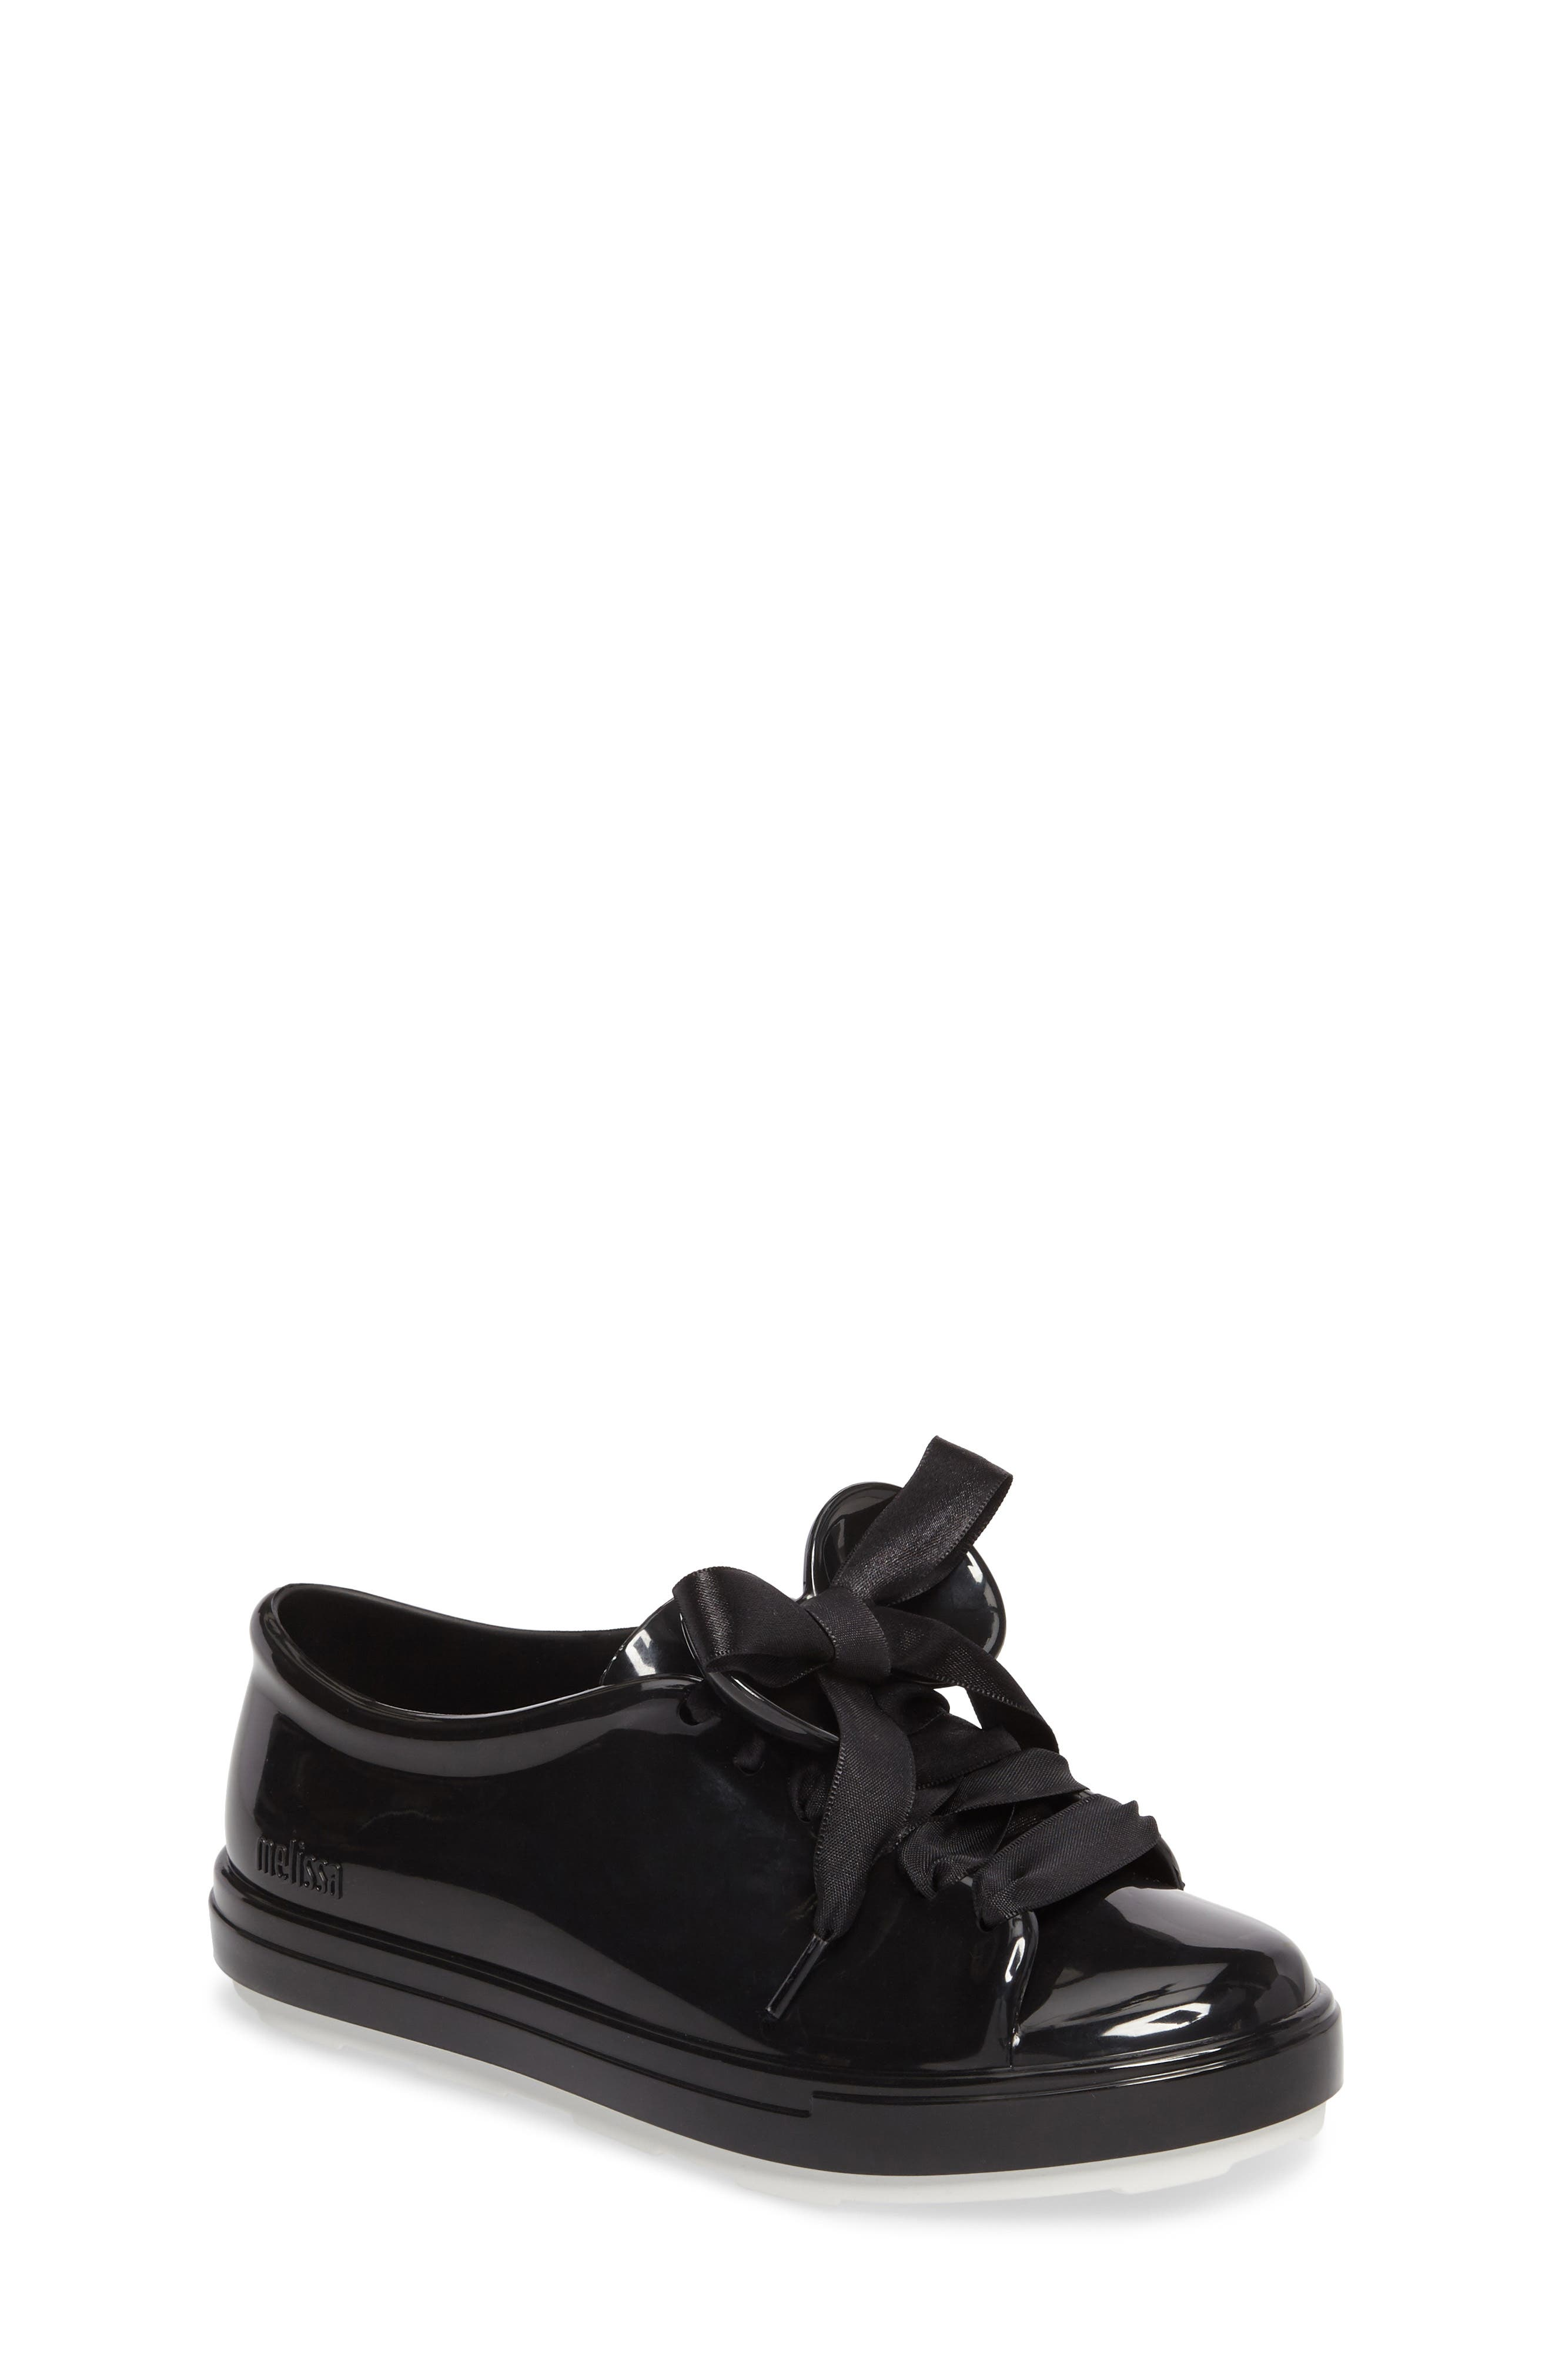 Alternate Image 1 Selected - Mel by Melissa Ultragirl + Disney® Sneaker (Toddler, Little Kid & Big Kid)